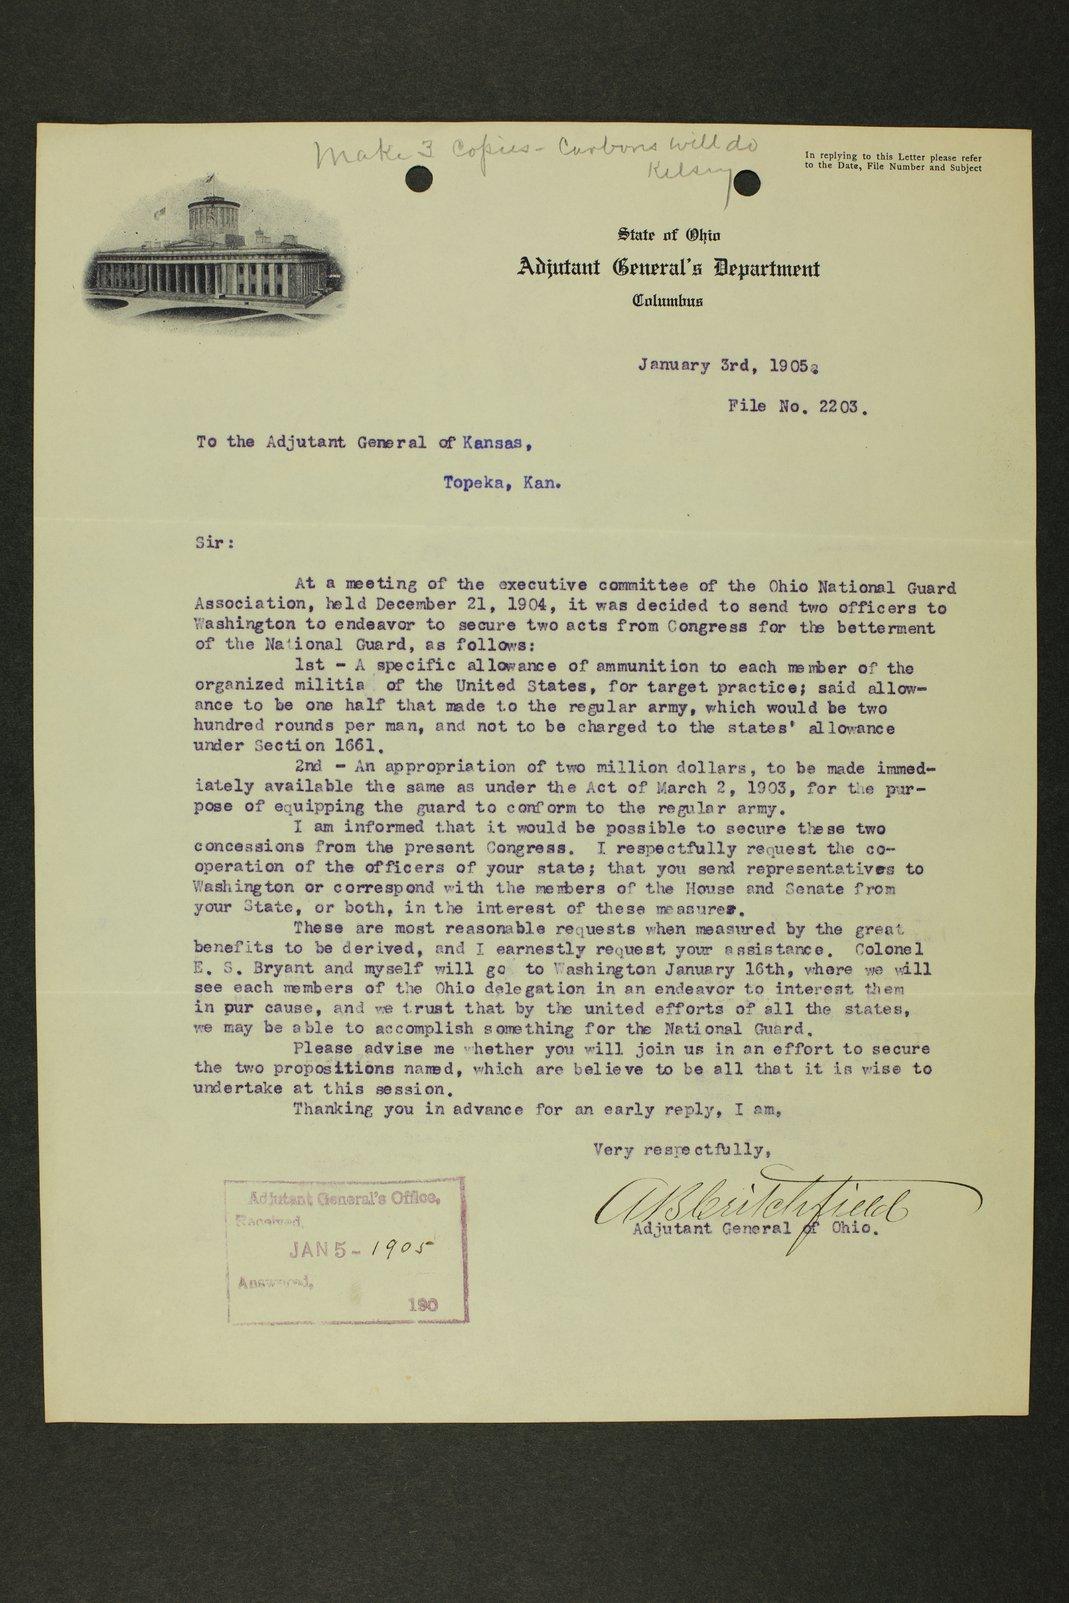 Kansas Adjutant General miscellaneous correspondence - 1